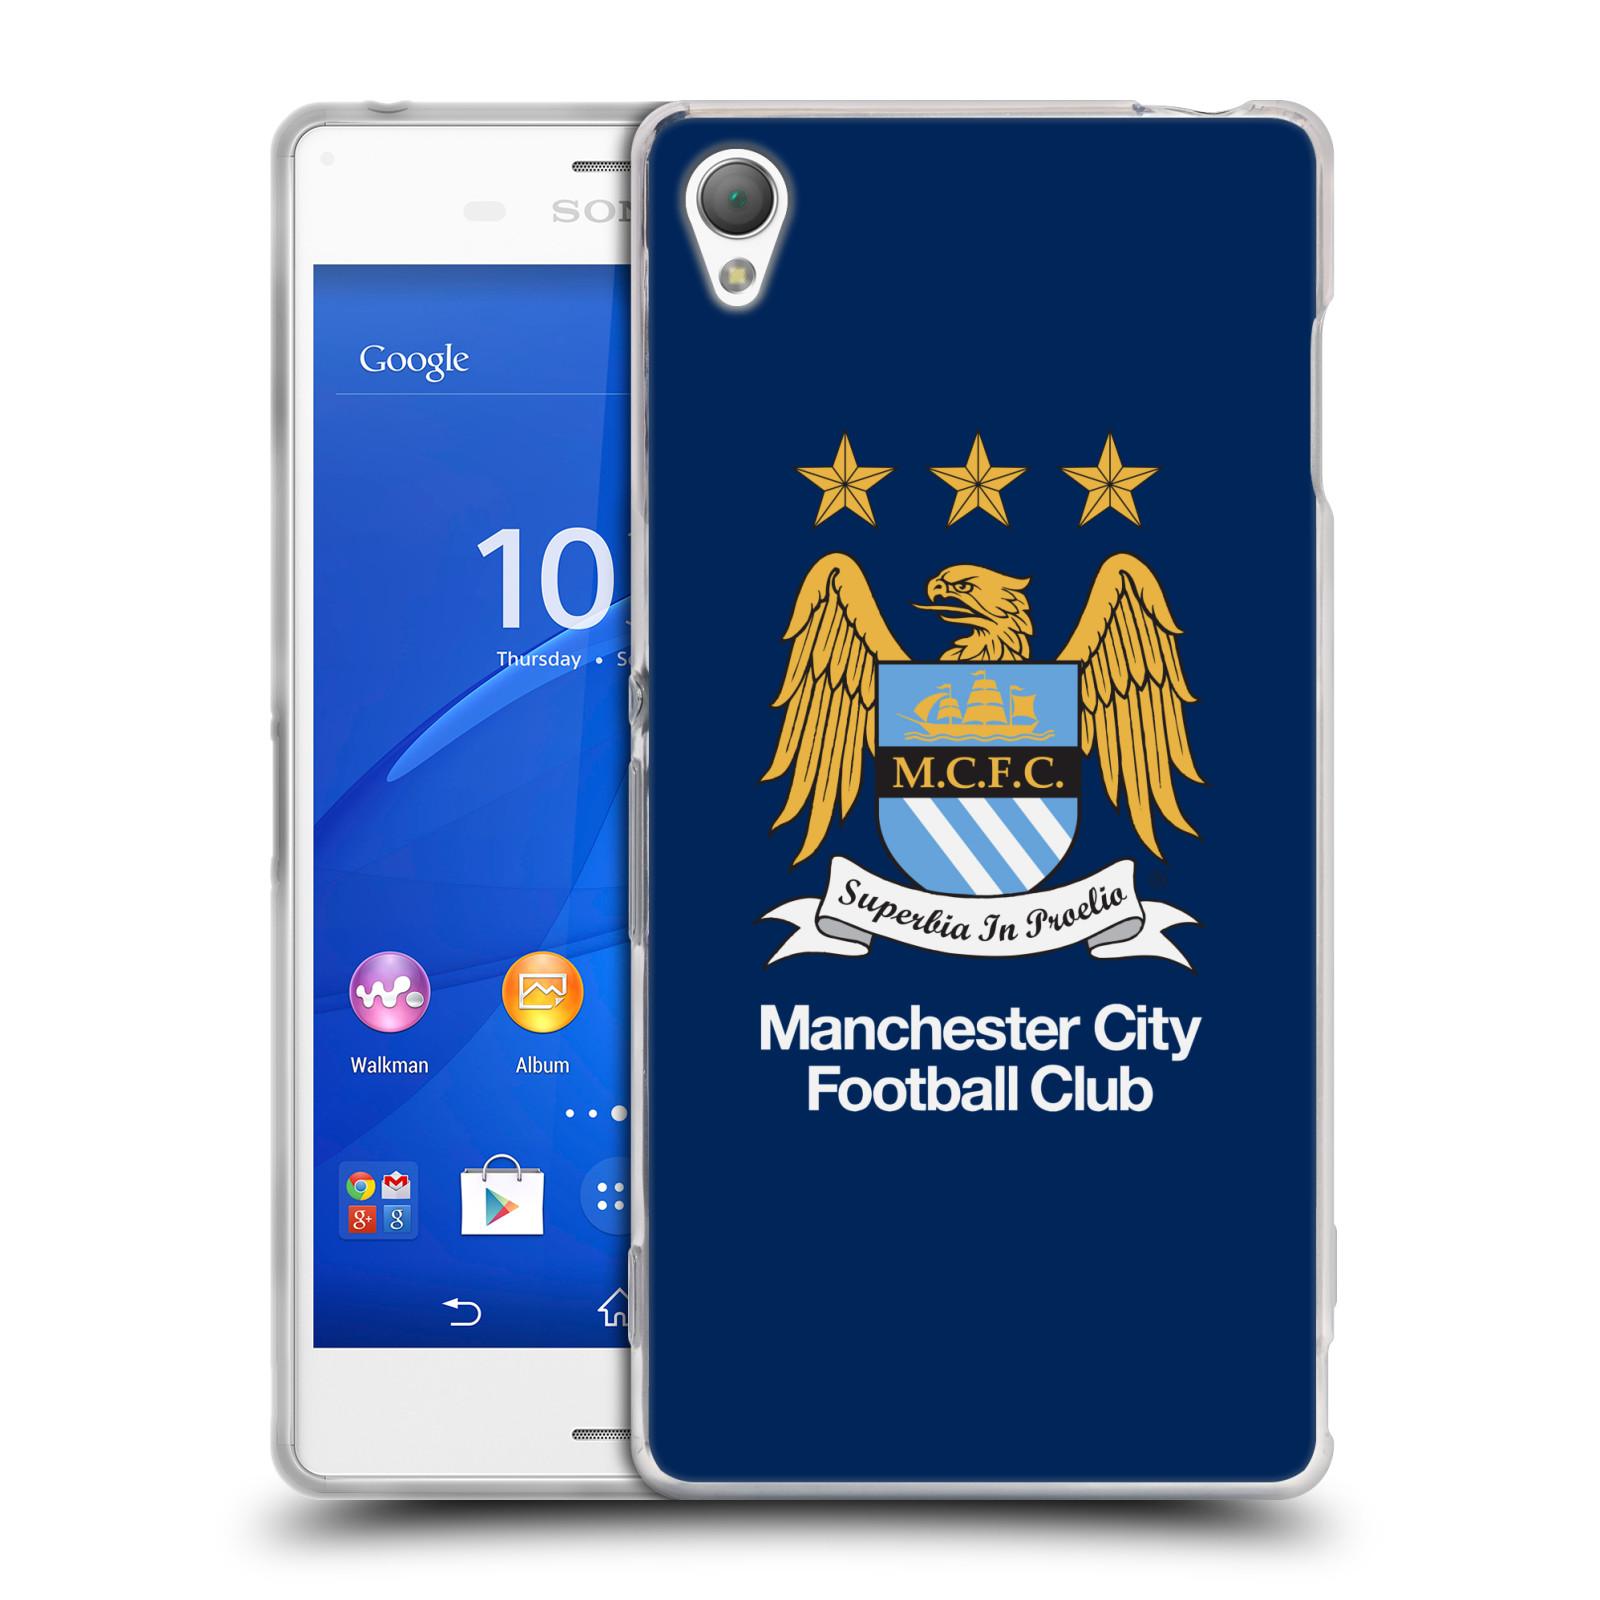 HEAD CASE silikonový obal na mobil Sony Xperia Z3 Fotbalový klub Manchester City modré pozadí velký znak